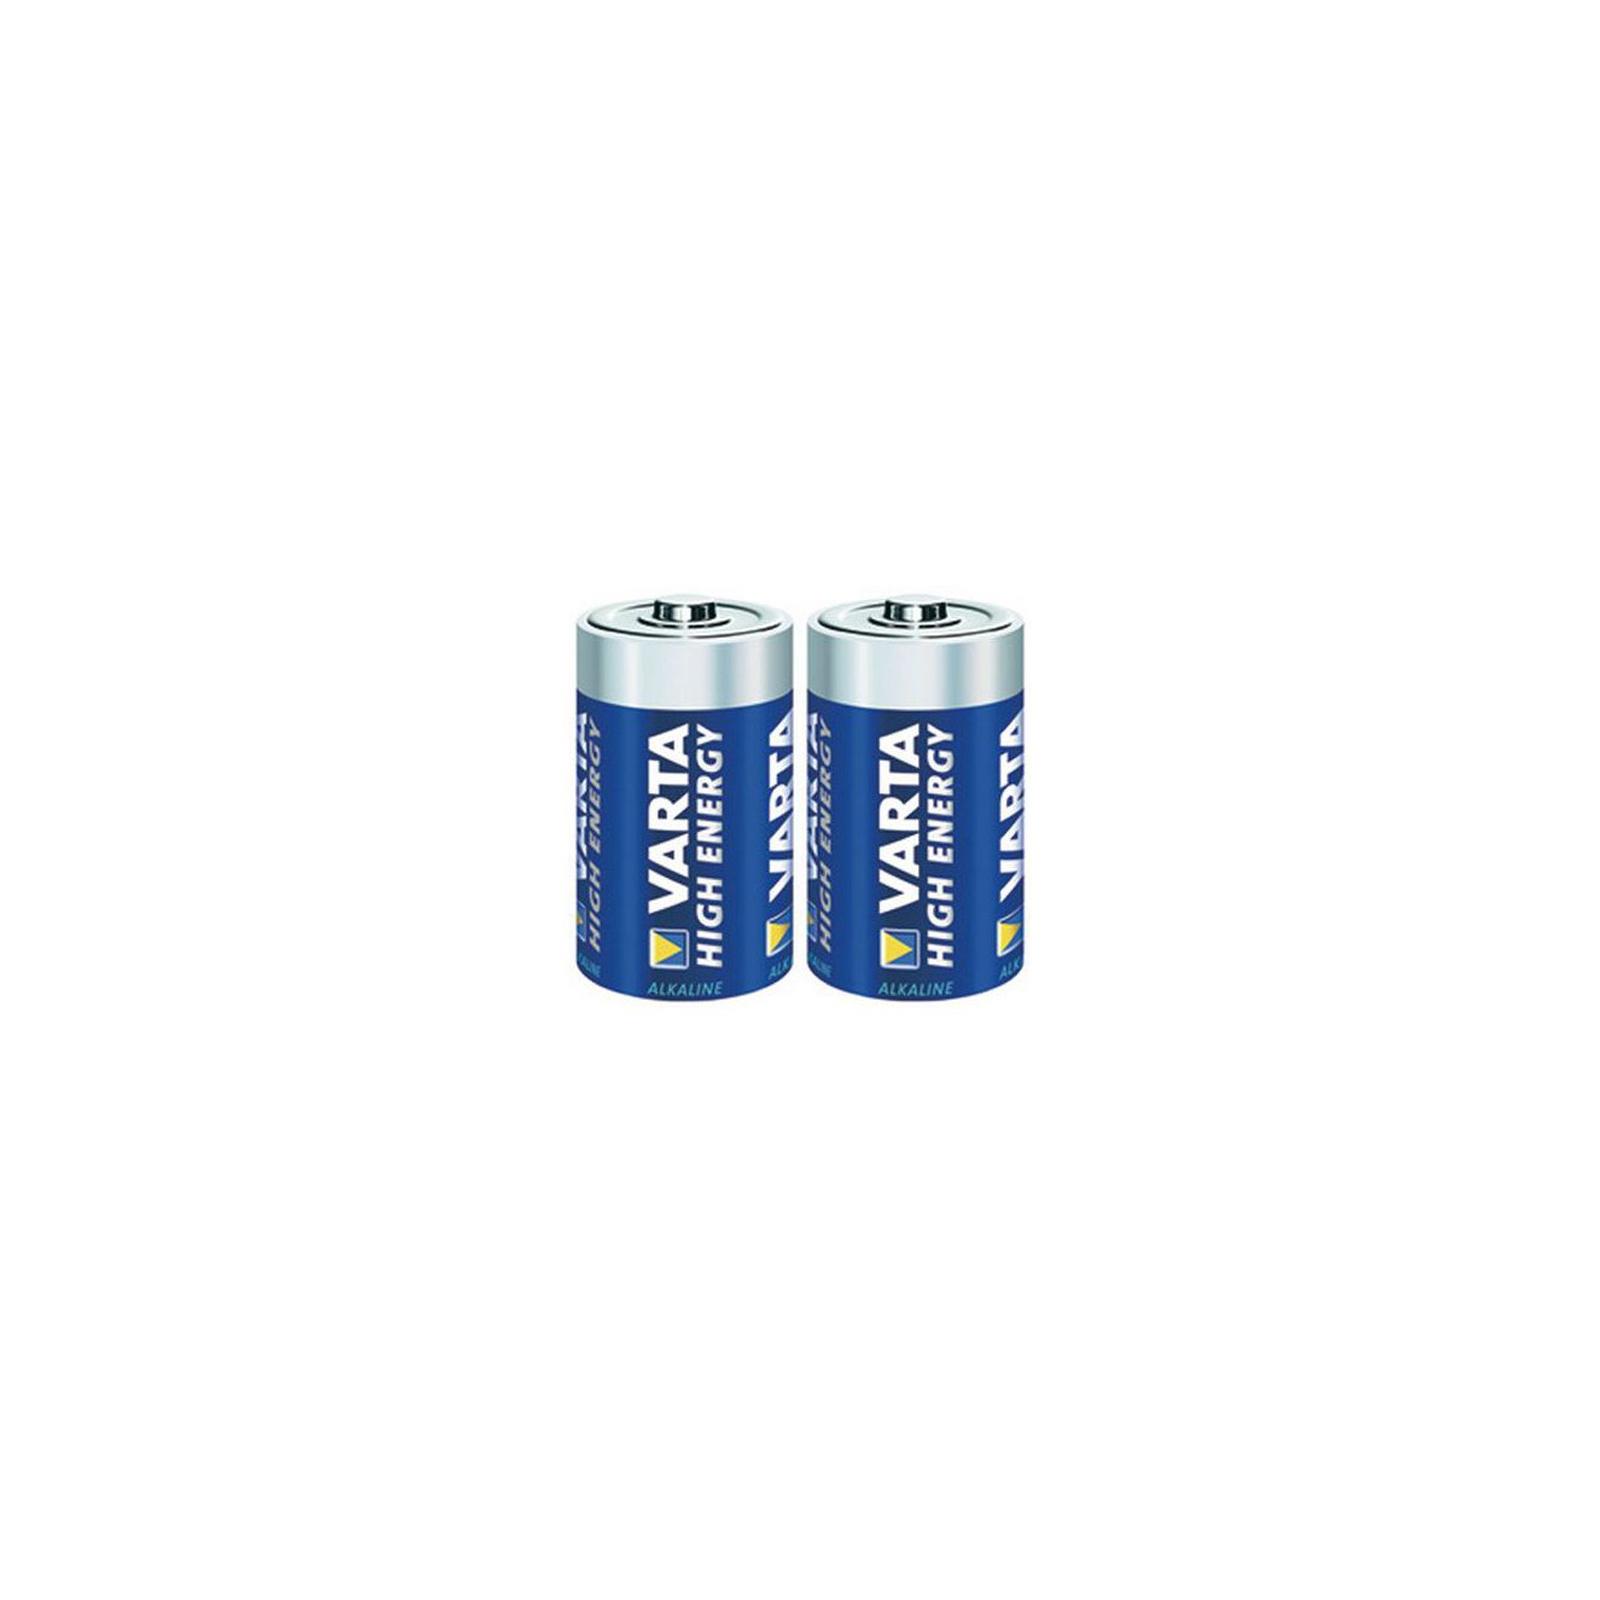 Батарейка Varta HIGH Energy ALKALINE * 2 (4914121412) изображение 2